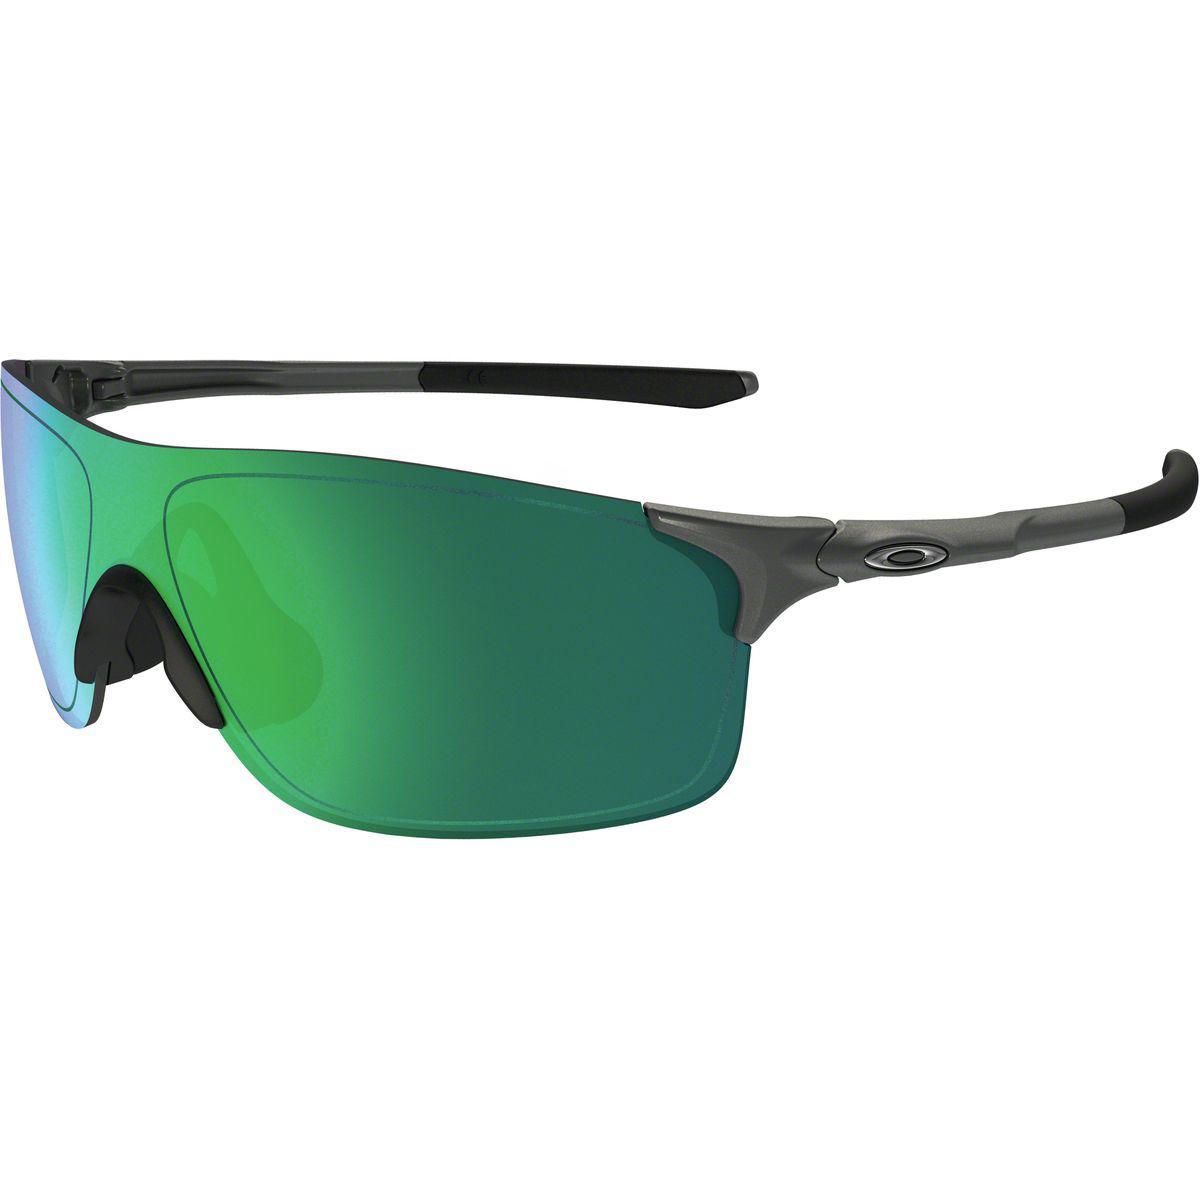 729b84bb1d Lyst - Oakley Evzero Pitch Sunglasses in Green for Men